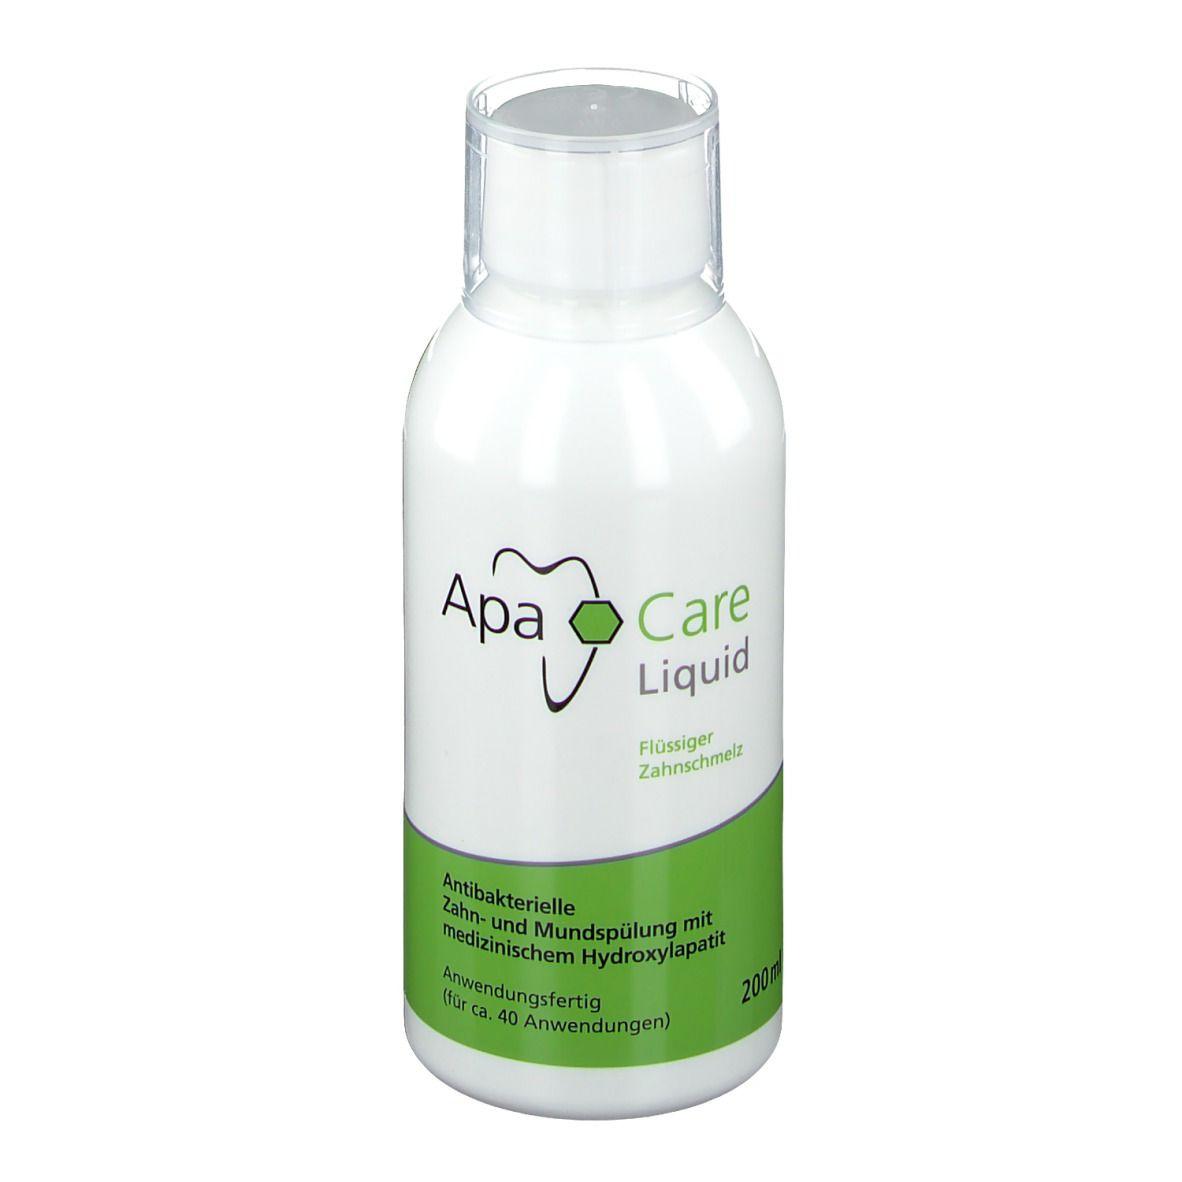 Image of ApaCare Liquid Zahnspülung